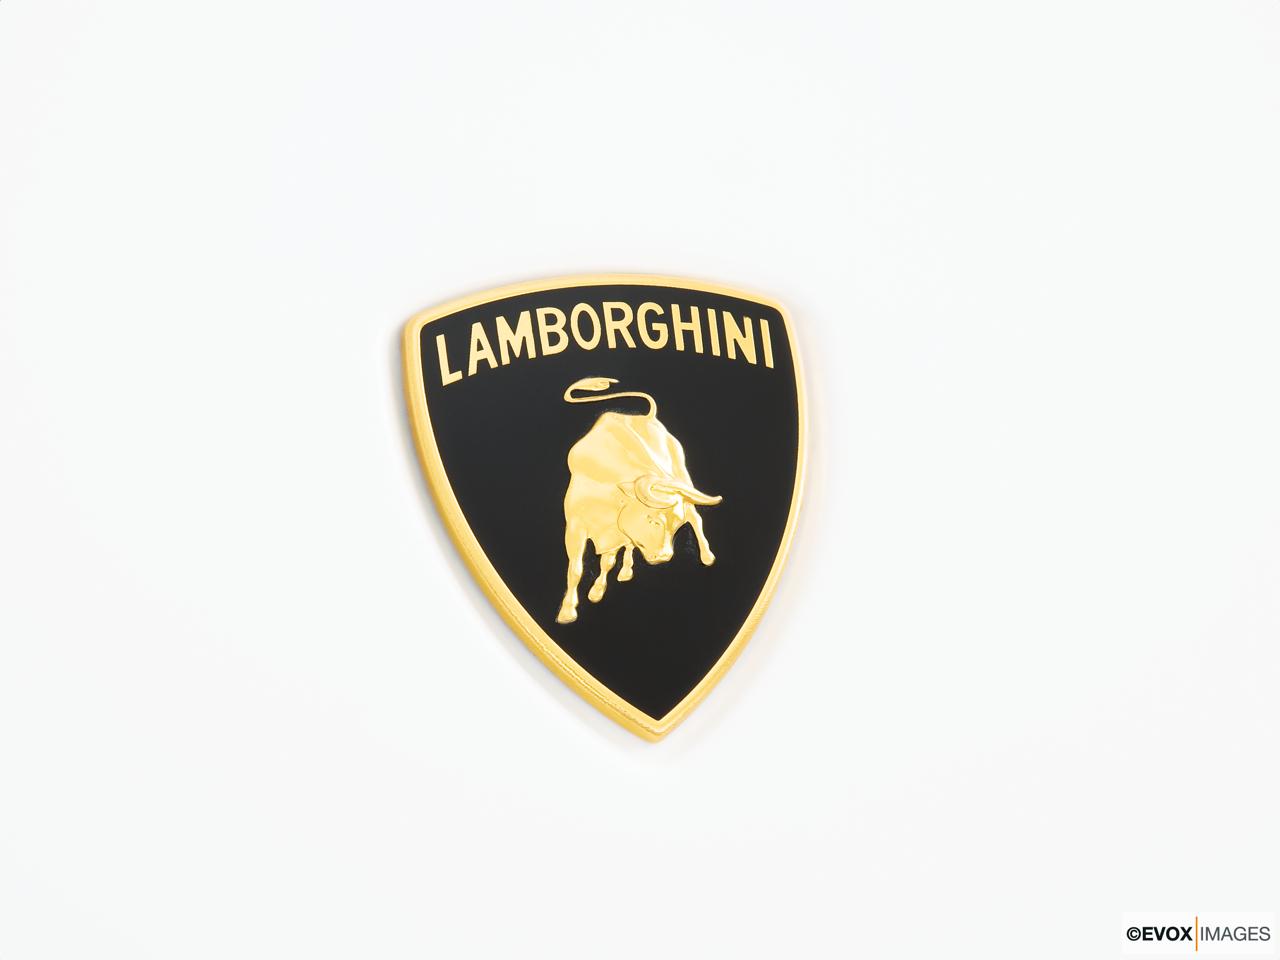 2013 Lamborghini Gallardo Convertible Lp570 4 Performante